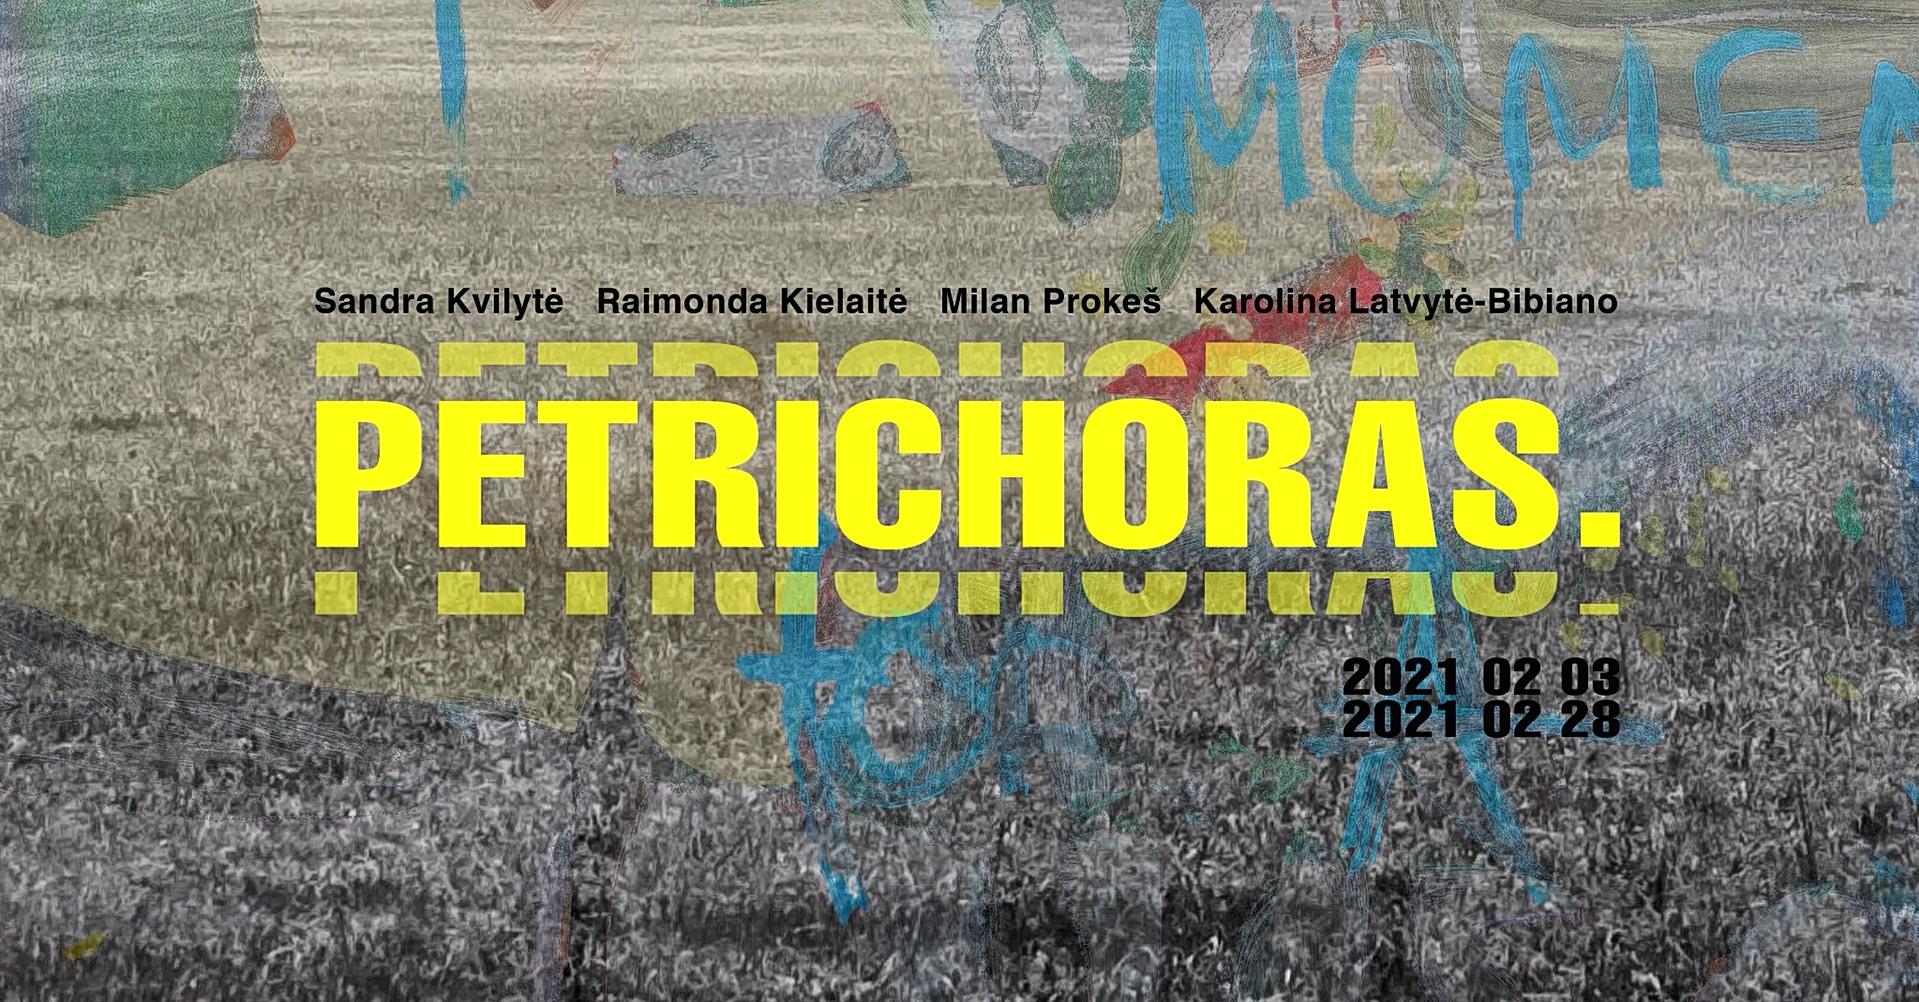 Petrichoras